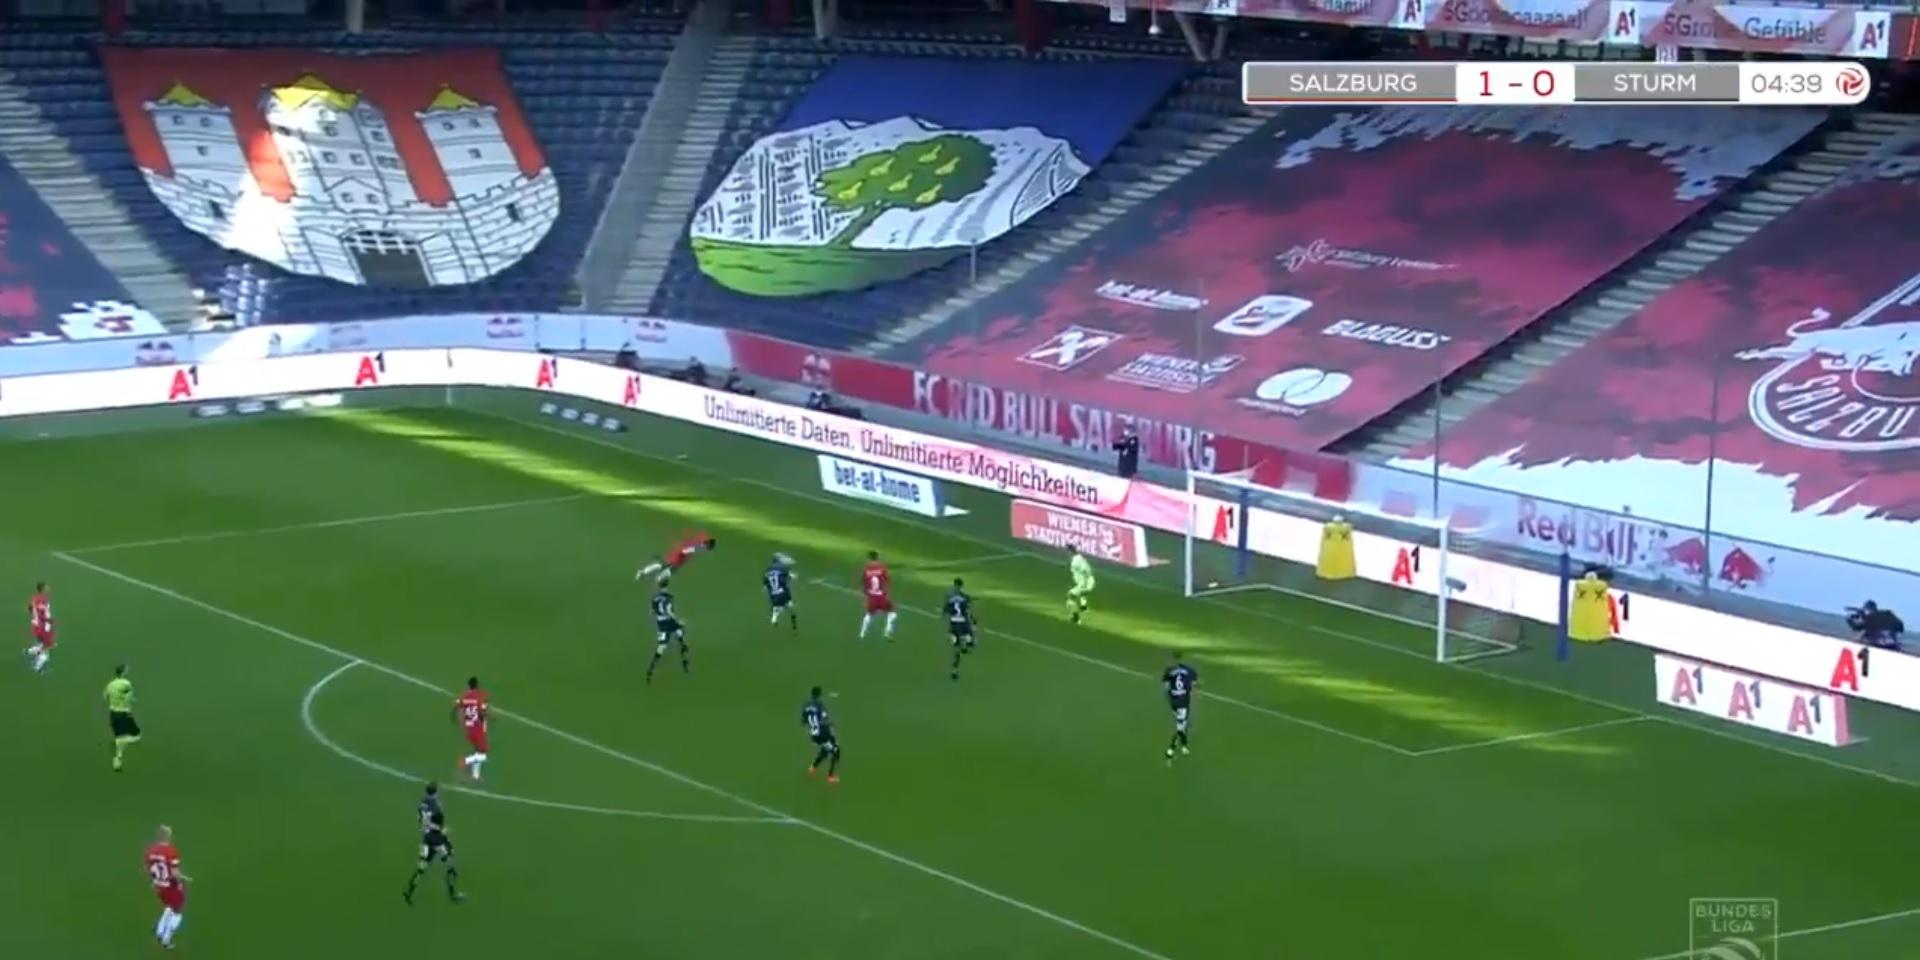 (Video) LFC-linked Patson Daka scores 11-minute hat-trick to make history